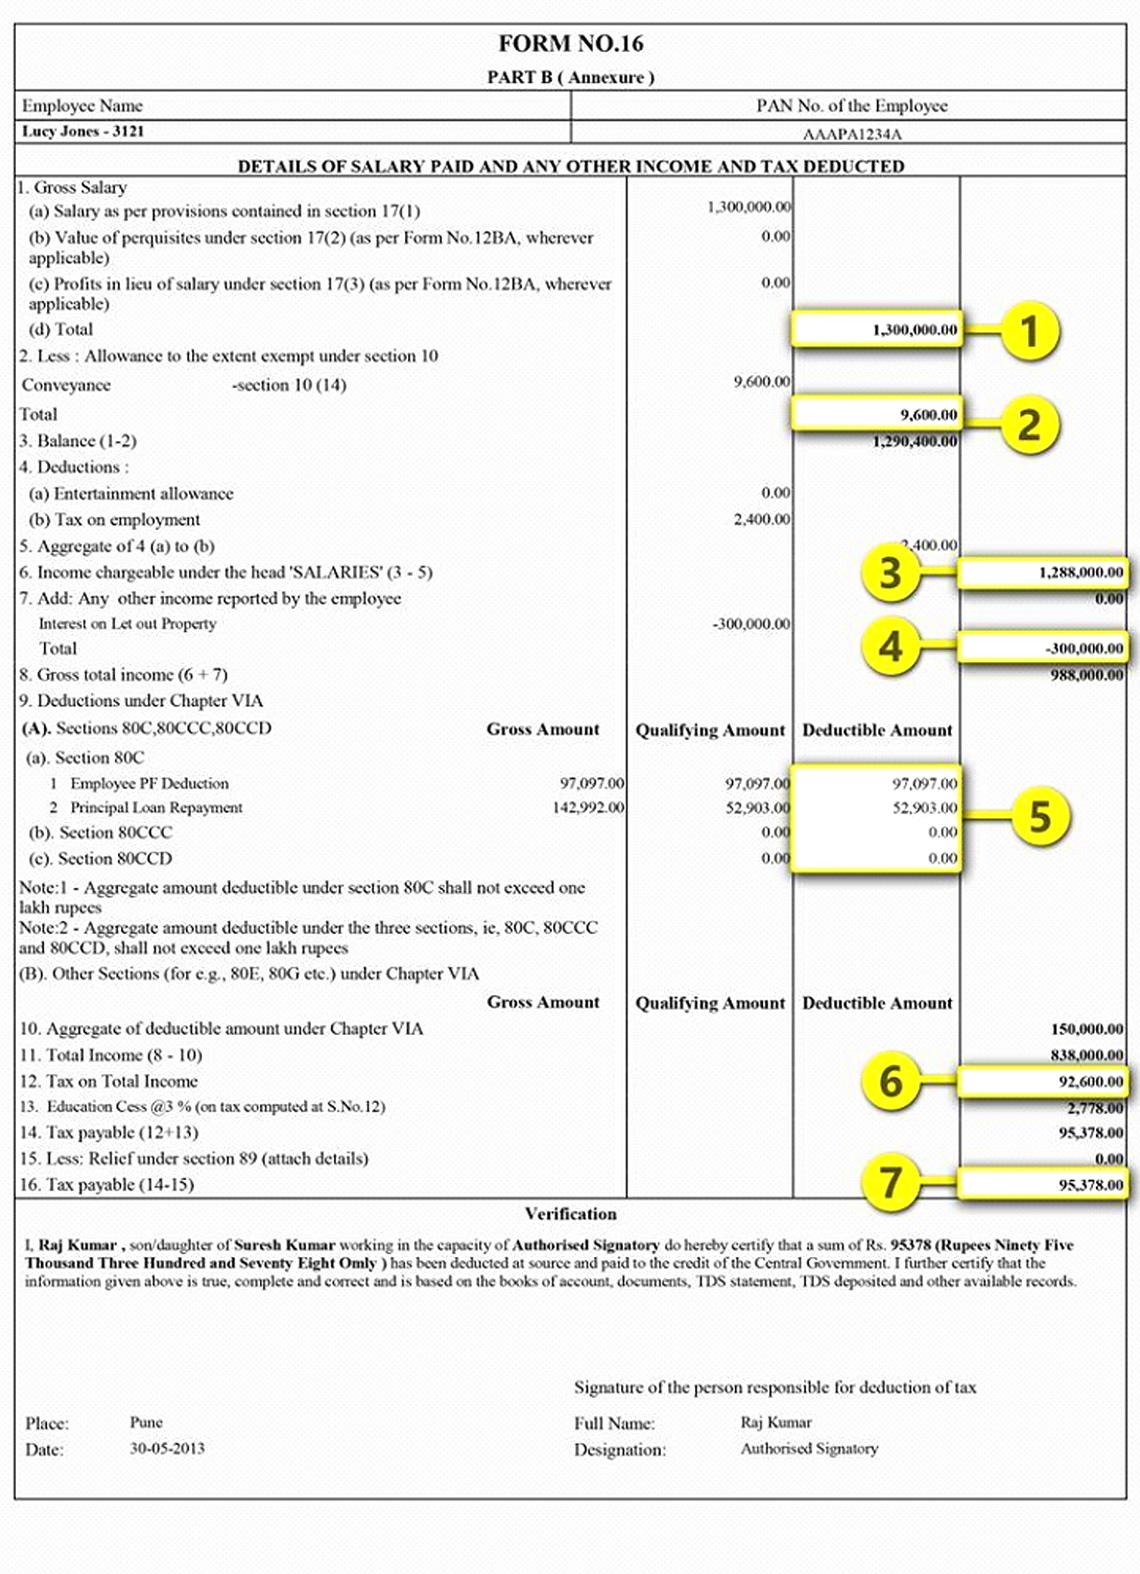 form 16 part B